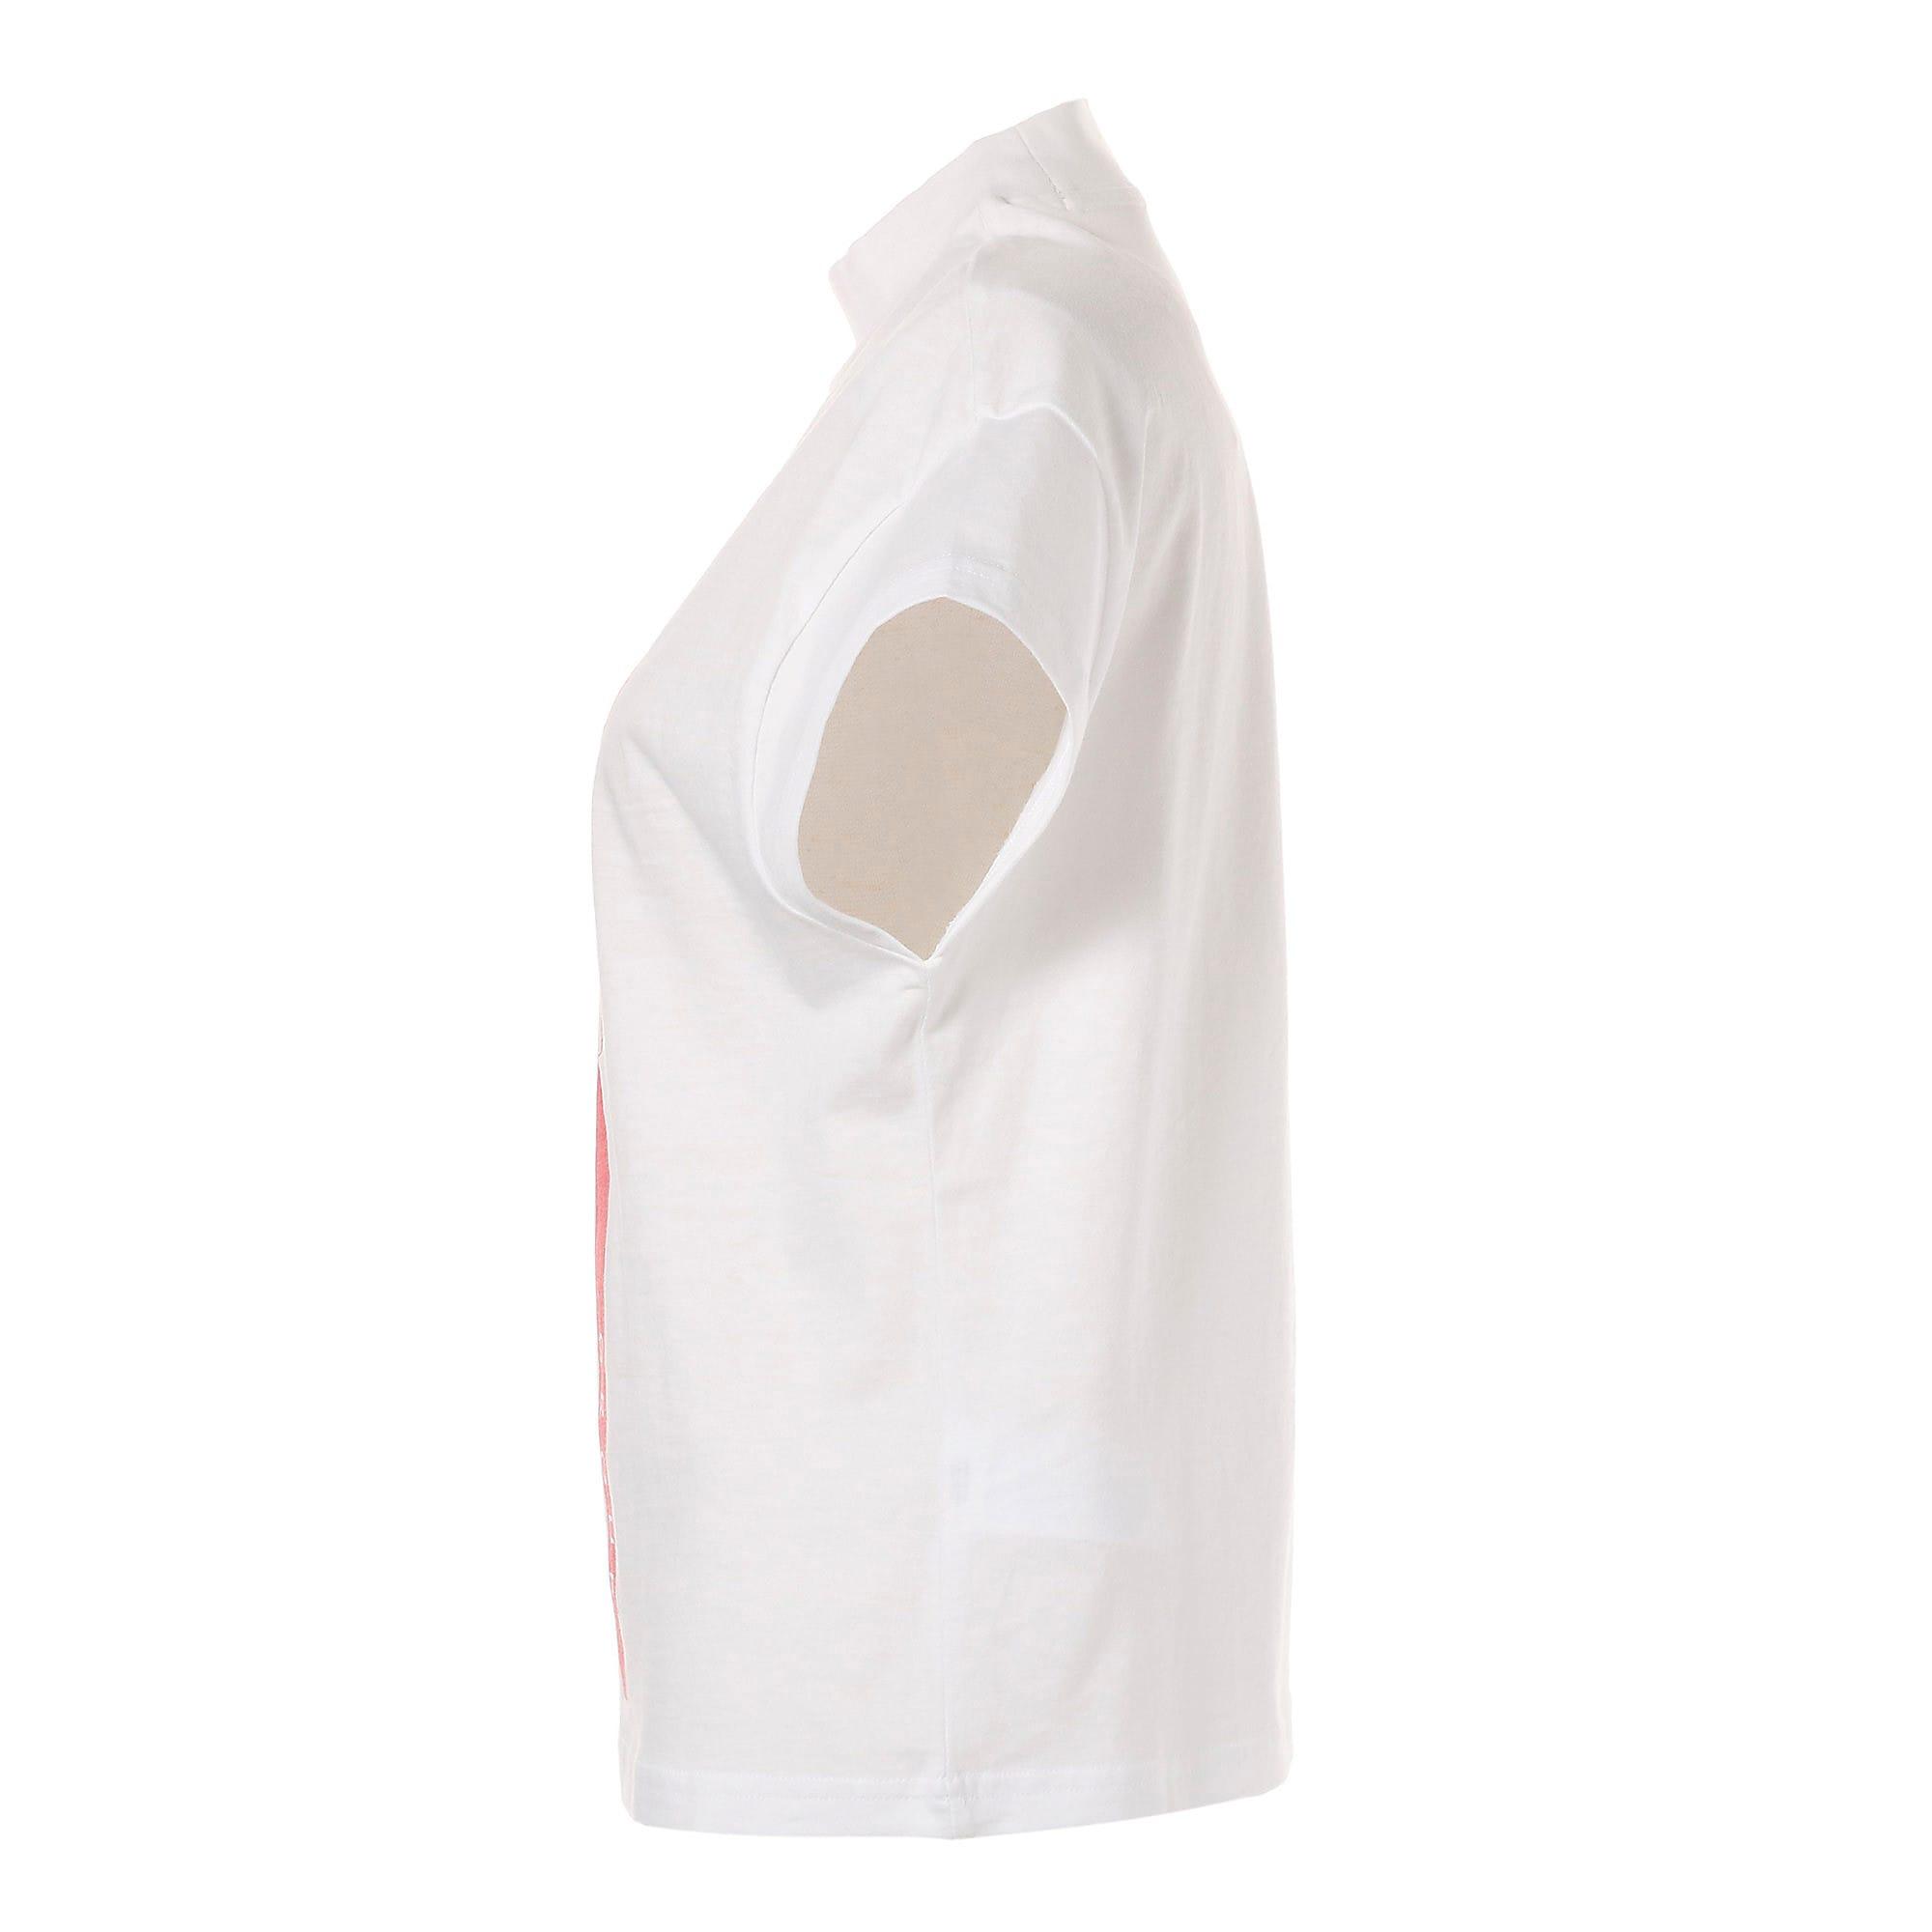 Thumbnail 10 of PUMA XTG グラフィック ウィメンズ SS Tシャツ 半袖, Puma White, medium-JPN